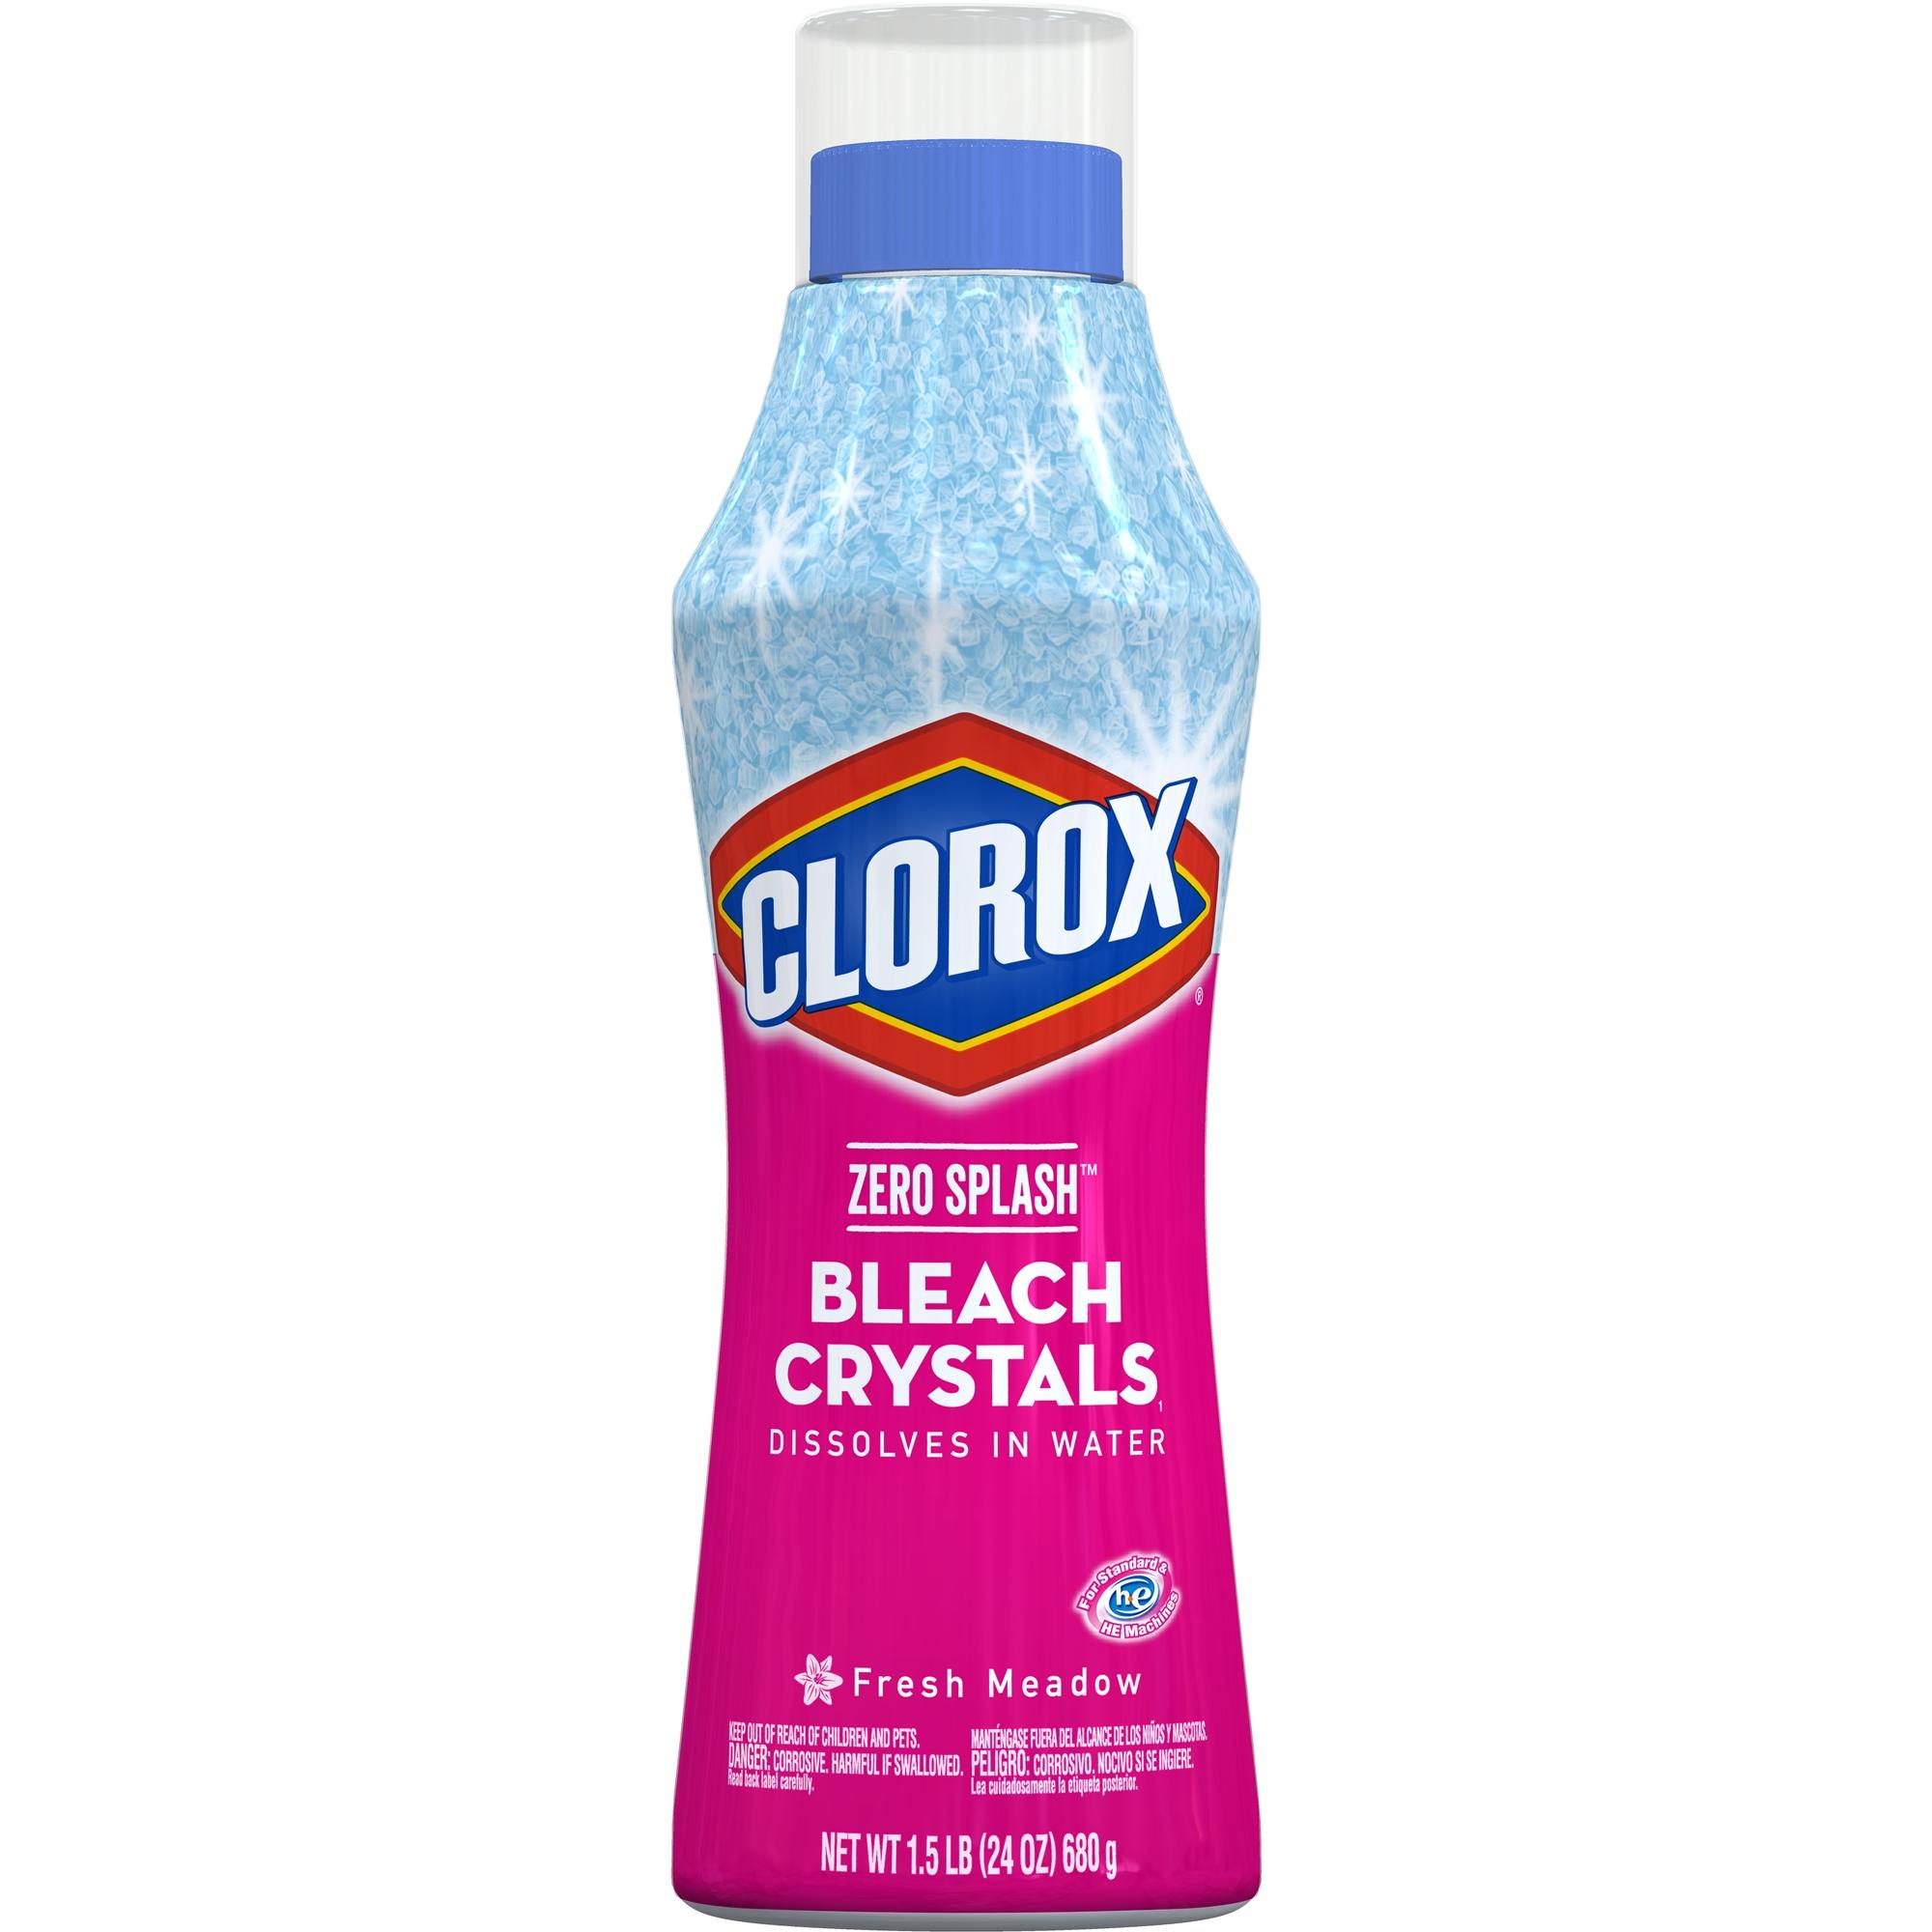 Clorox Zero Splash Bleach Crystals, Fresh Meadow, 24 oz